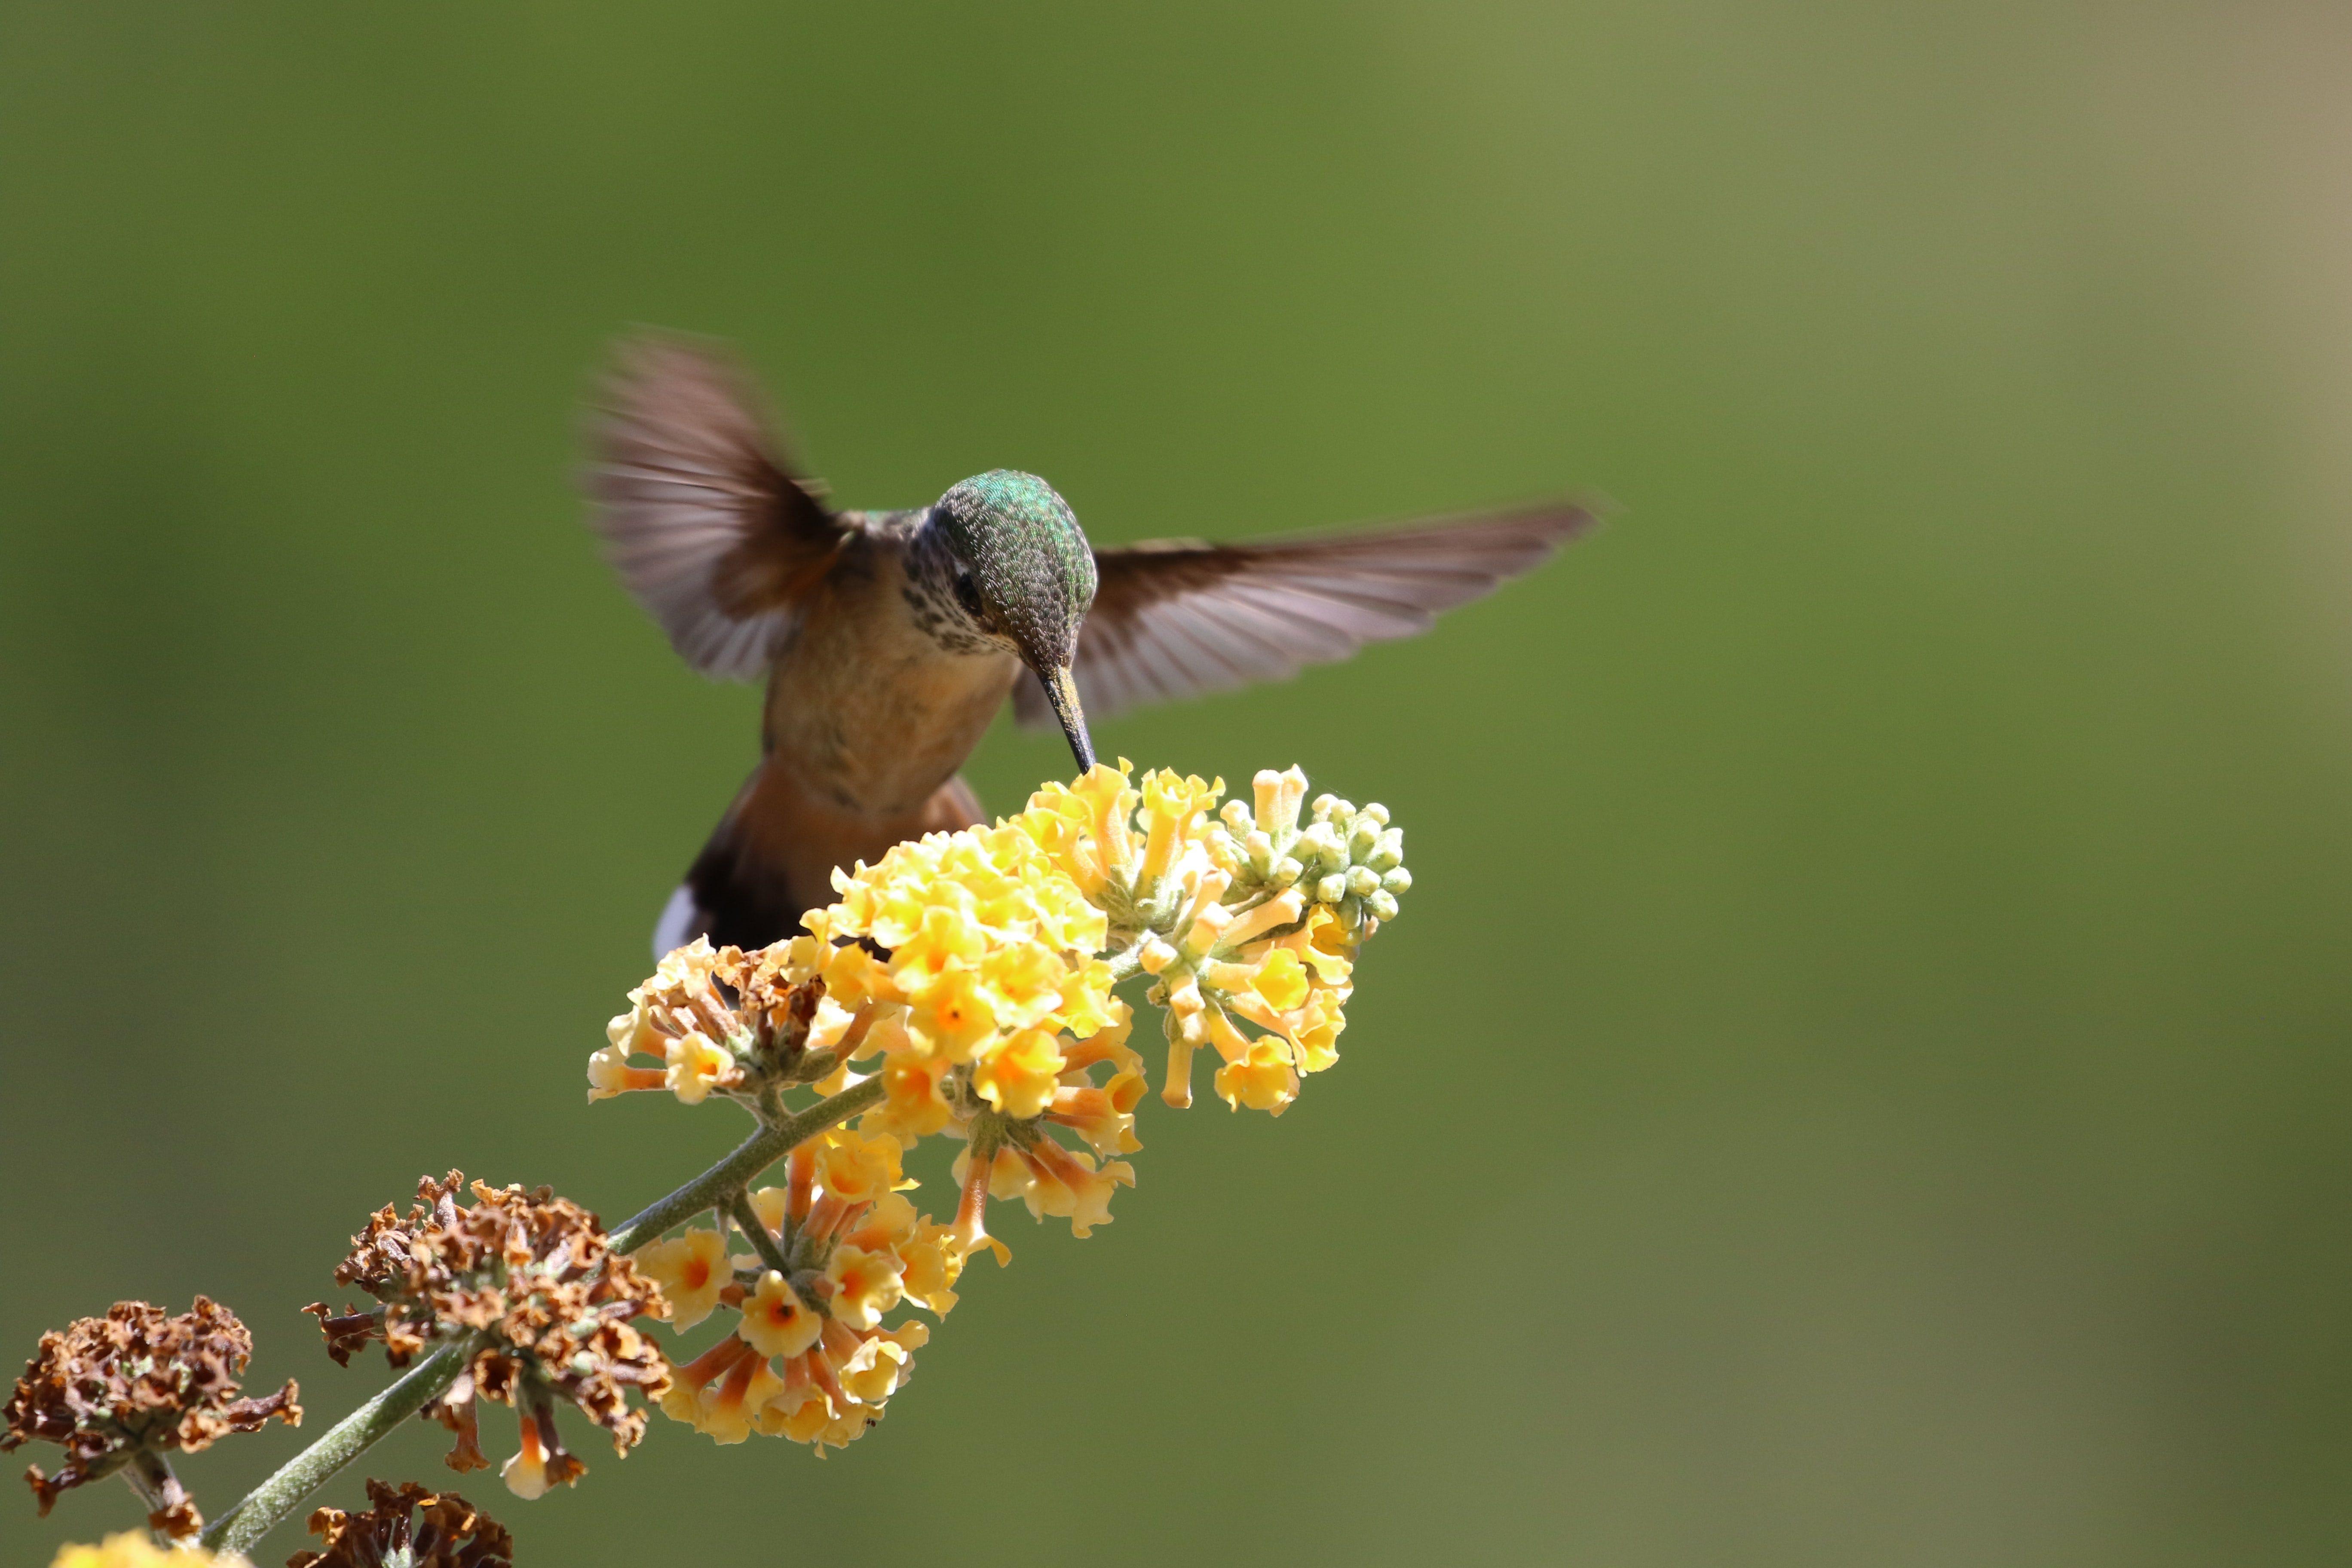 Hummingbird 6 15 2021 John Duncan Os Ukhti4Cak Unsplash